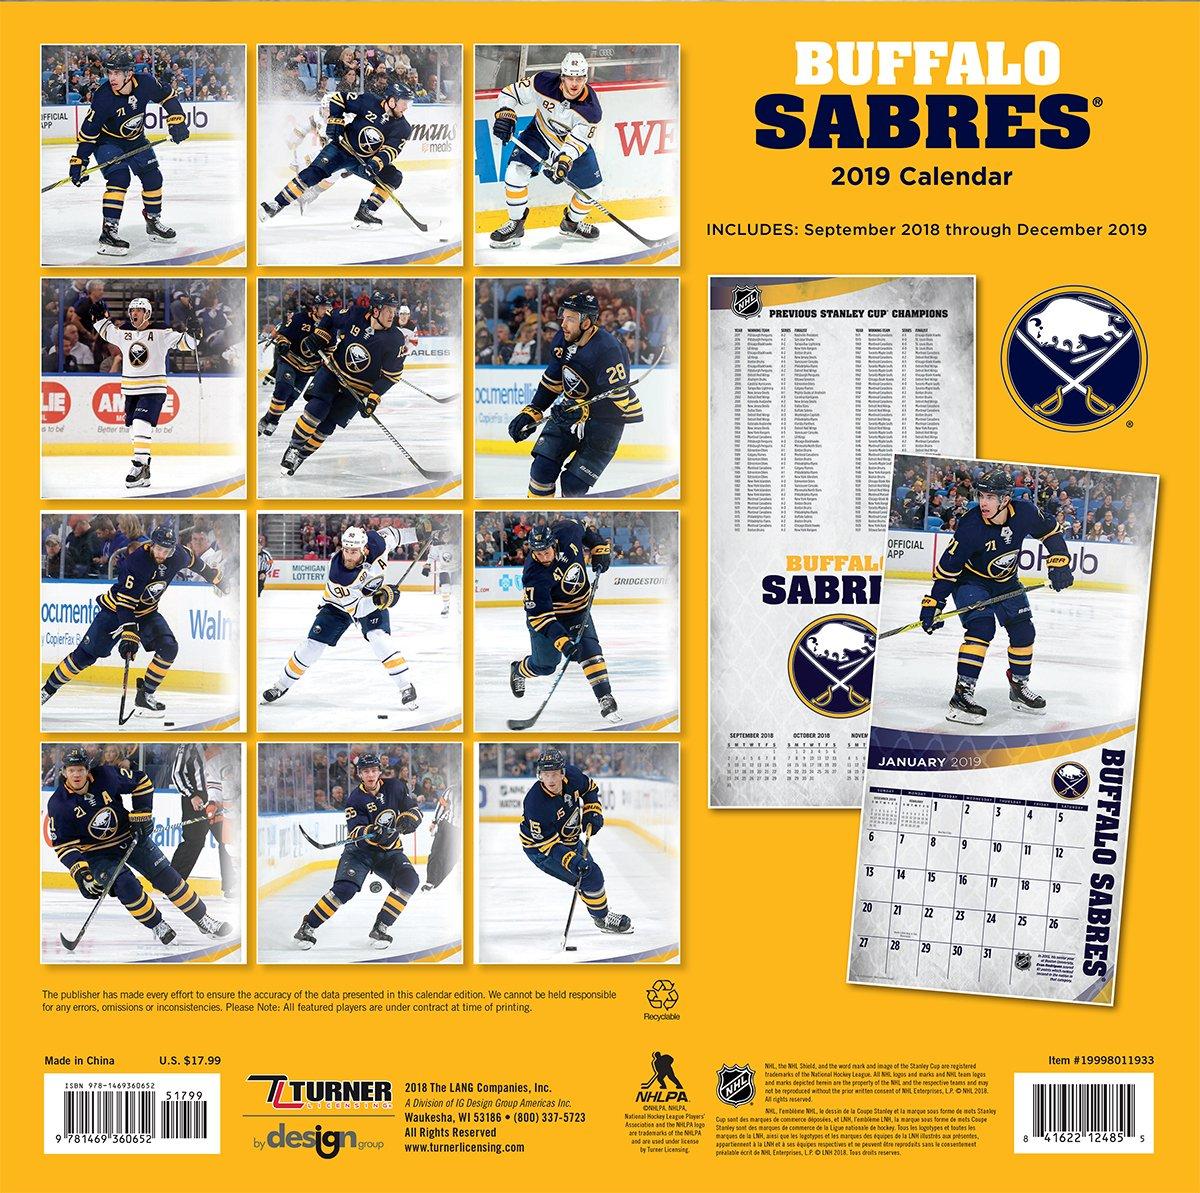 Turner 1 Sport Buffalo Sabres 2019 12X12 Team Wall Calendar Office Wall Calendar 19998011933